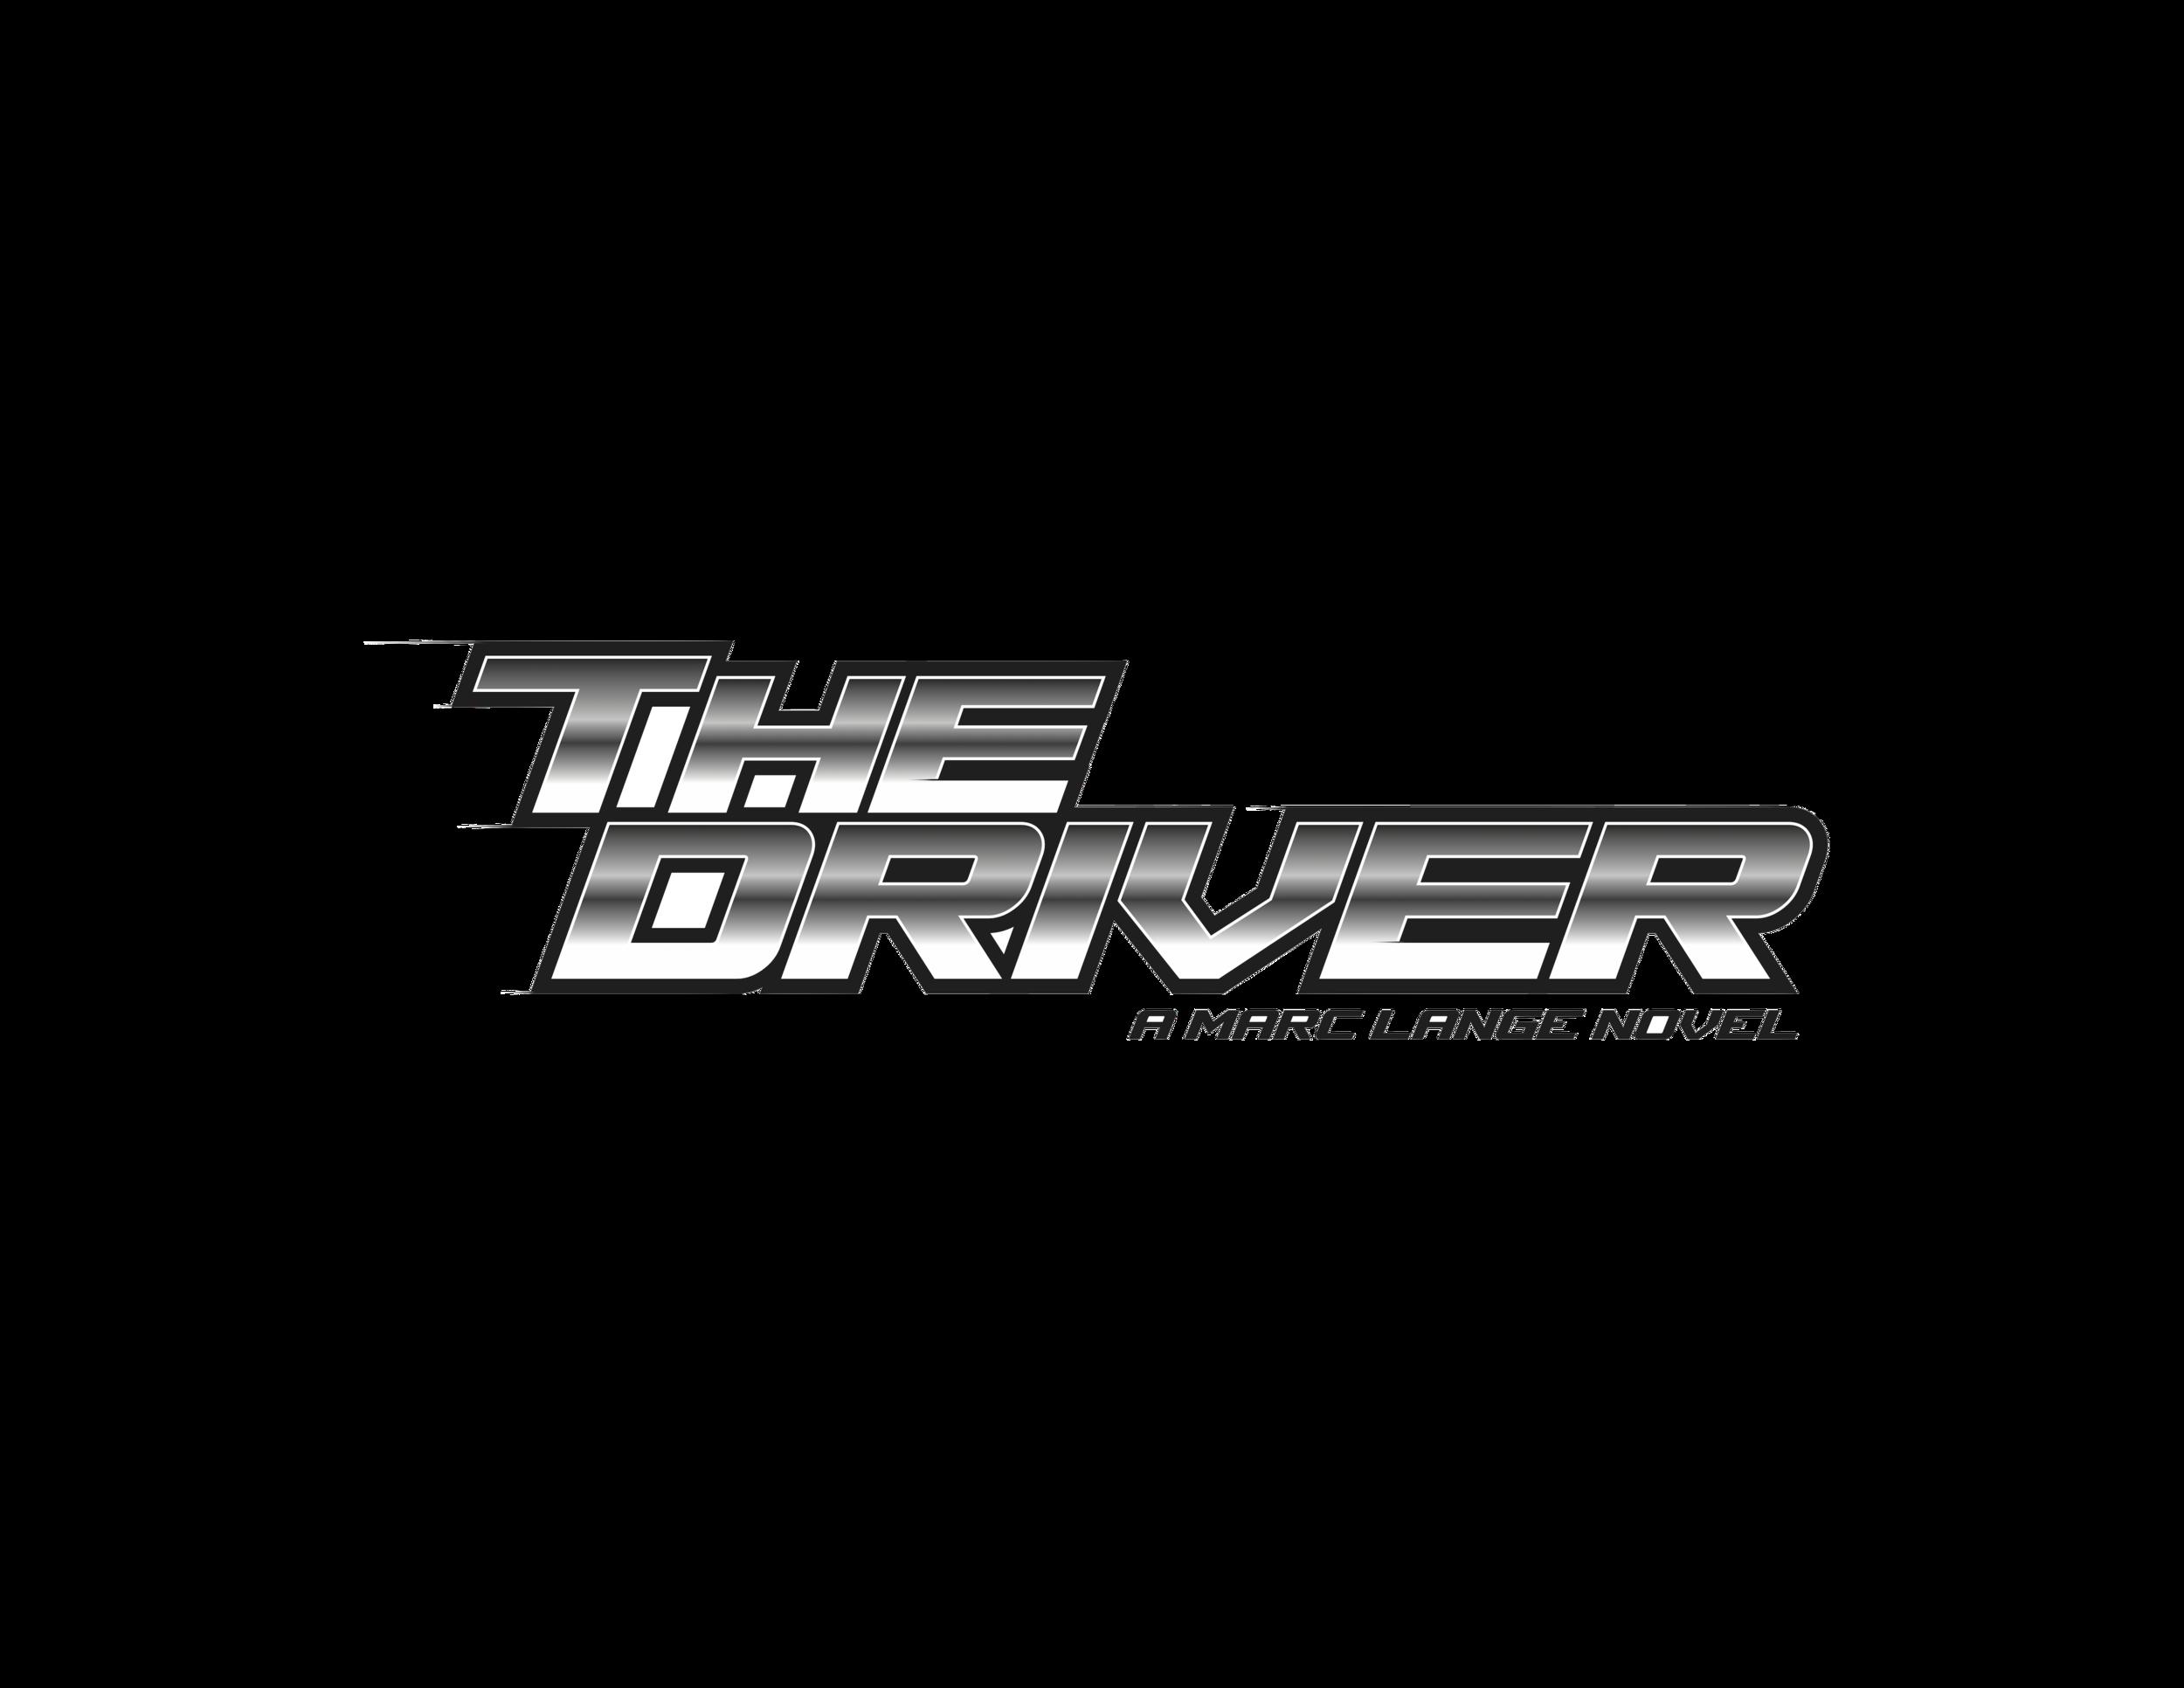 TheDriver-Logo 10-15-17 Transparent.png